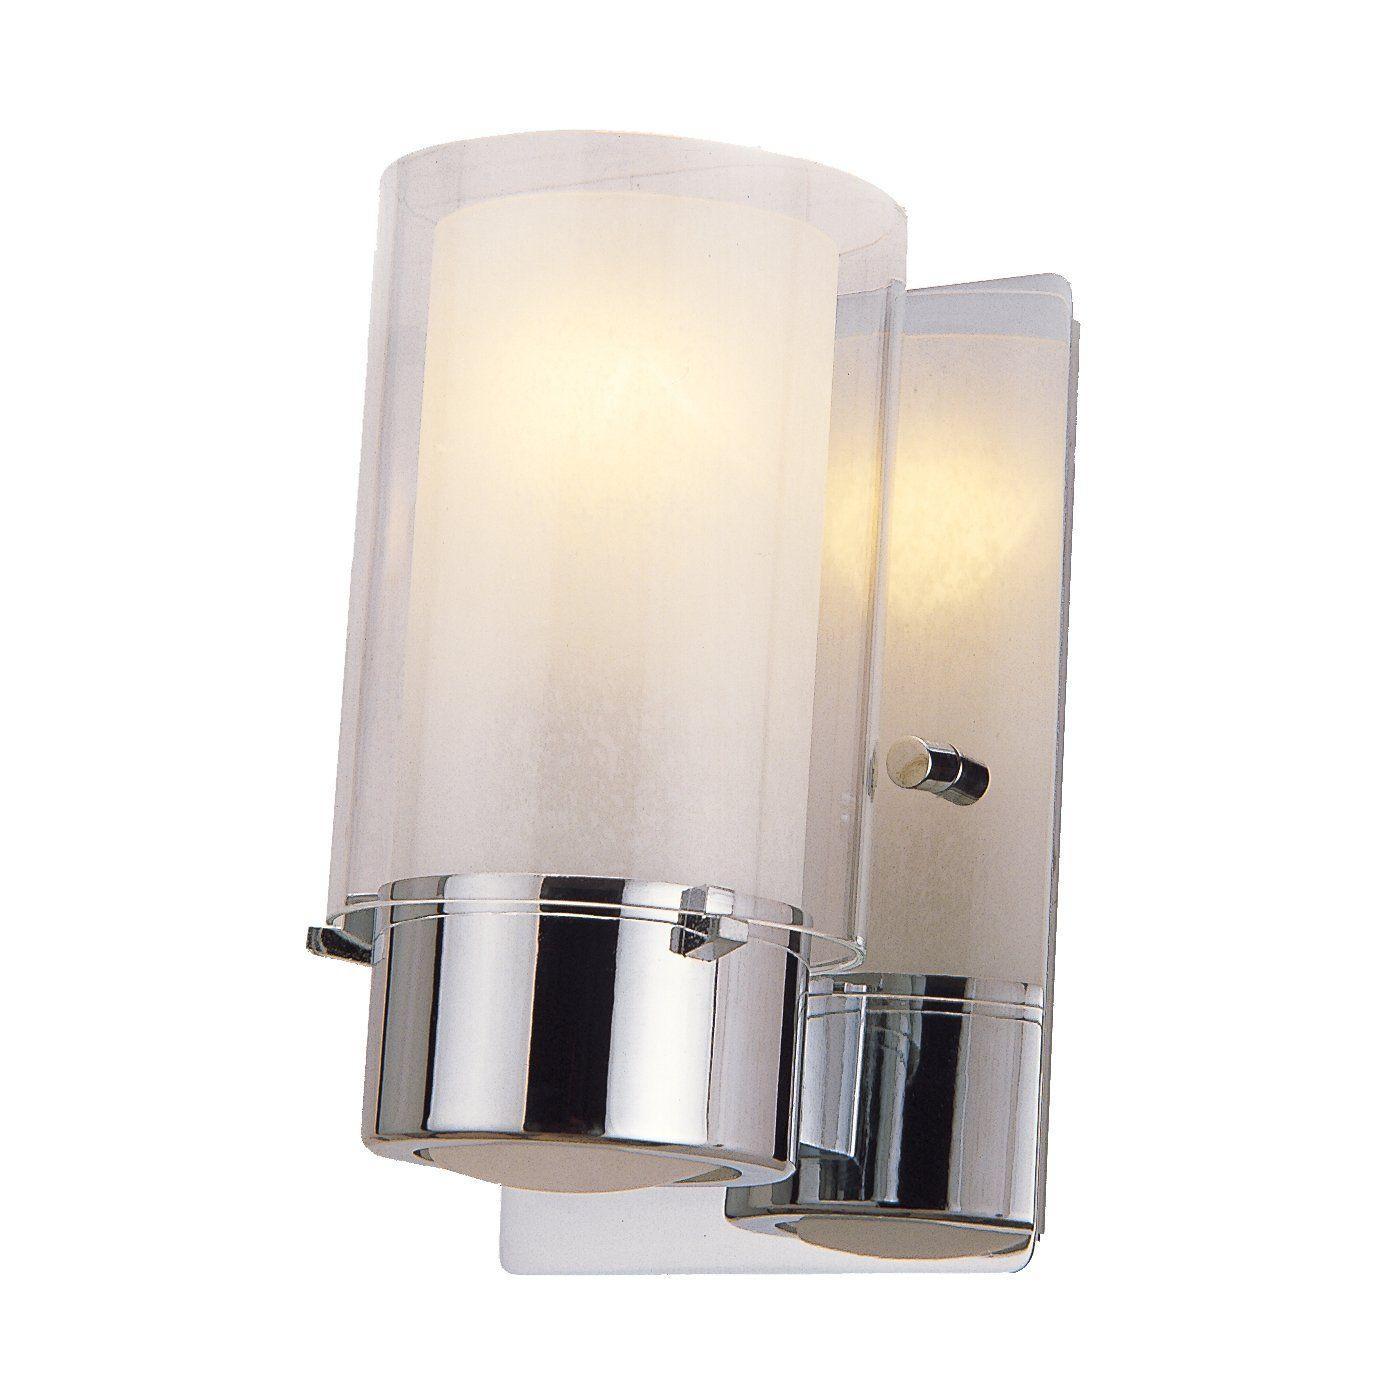 Bathroom wall lights with pull cord - Bathroom Wall Light Coolie Shade Pull Cord